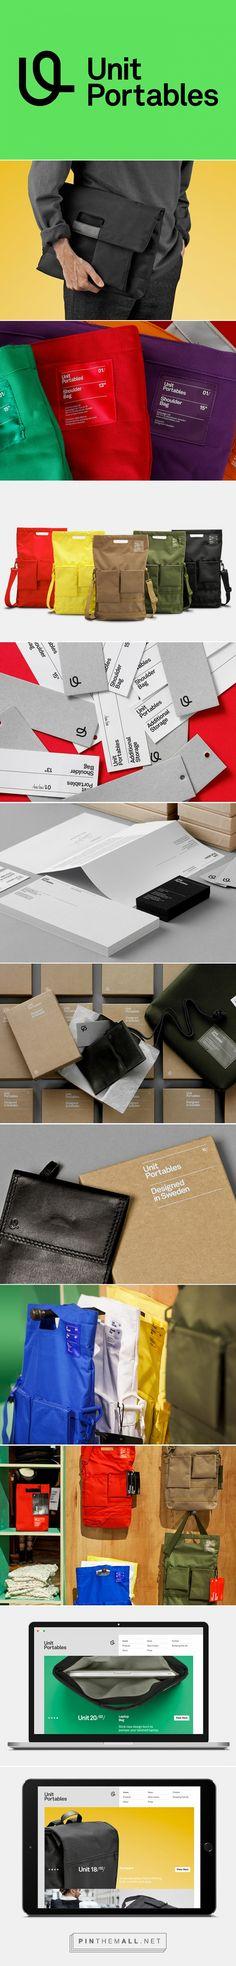 Unit Portables | AesseVisualJournal